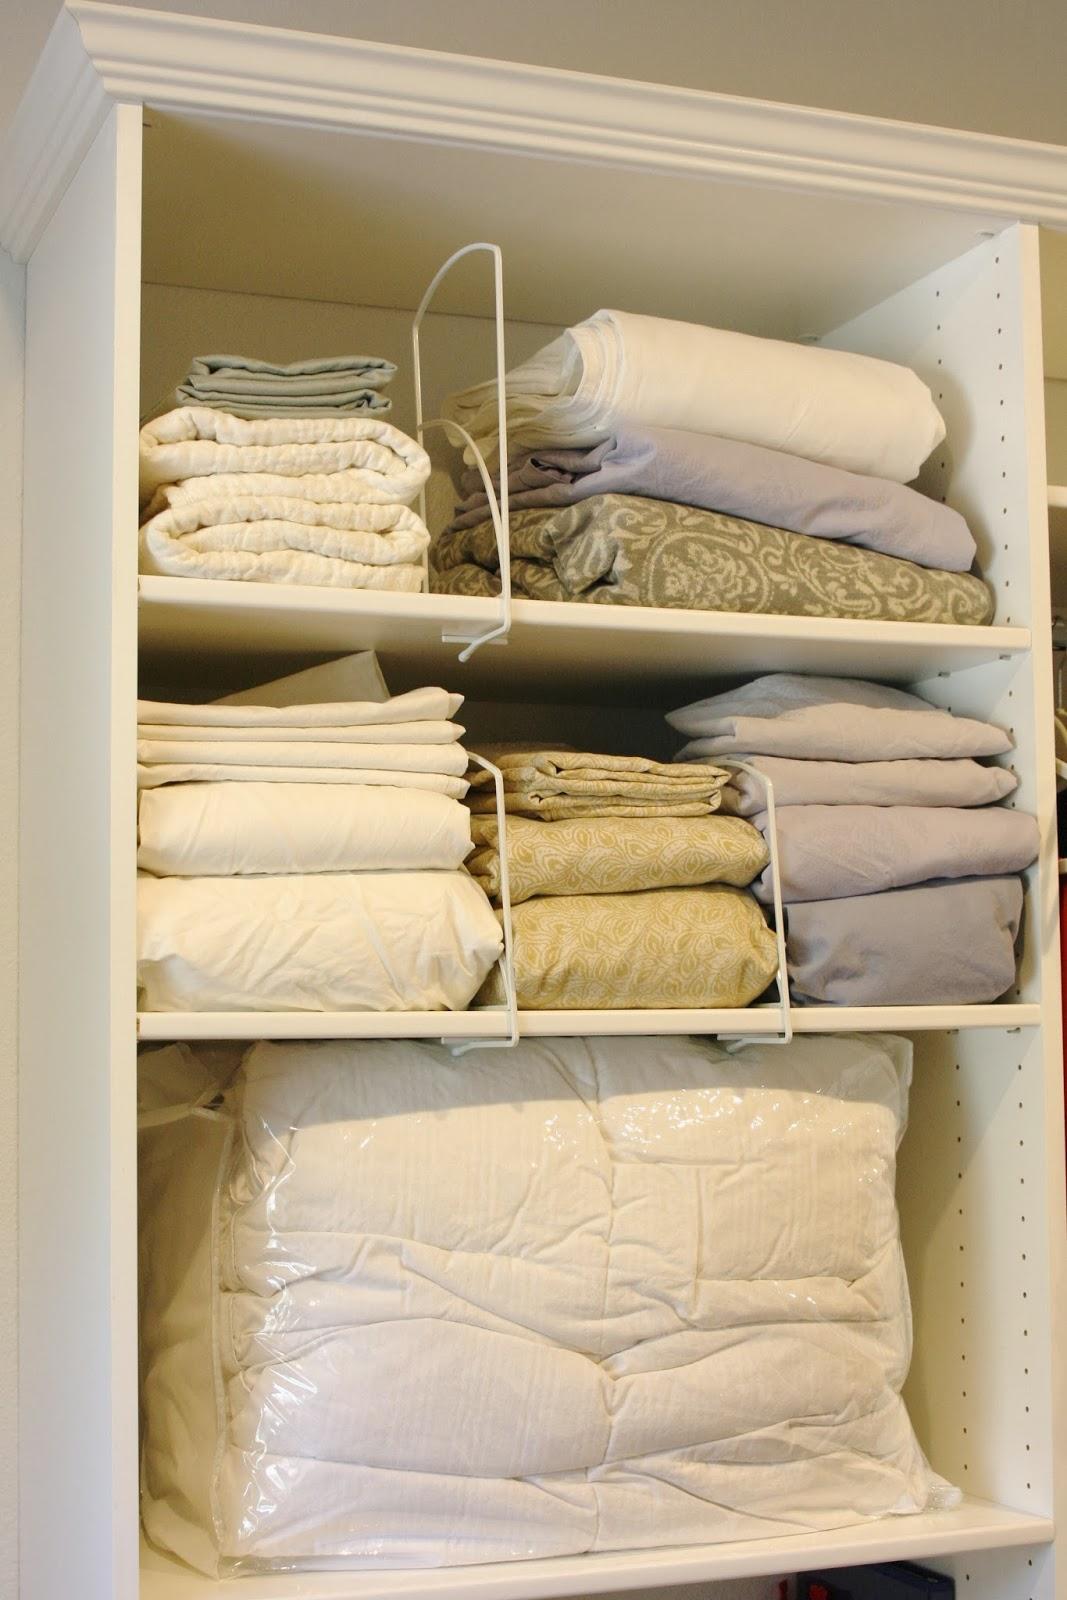 Simply Organized Organized Bedding